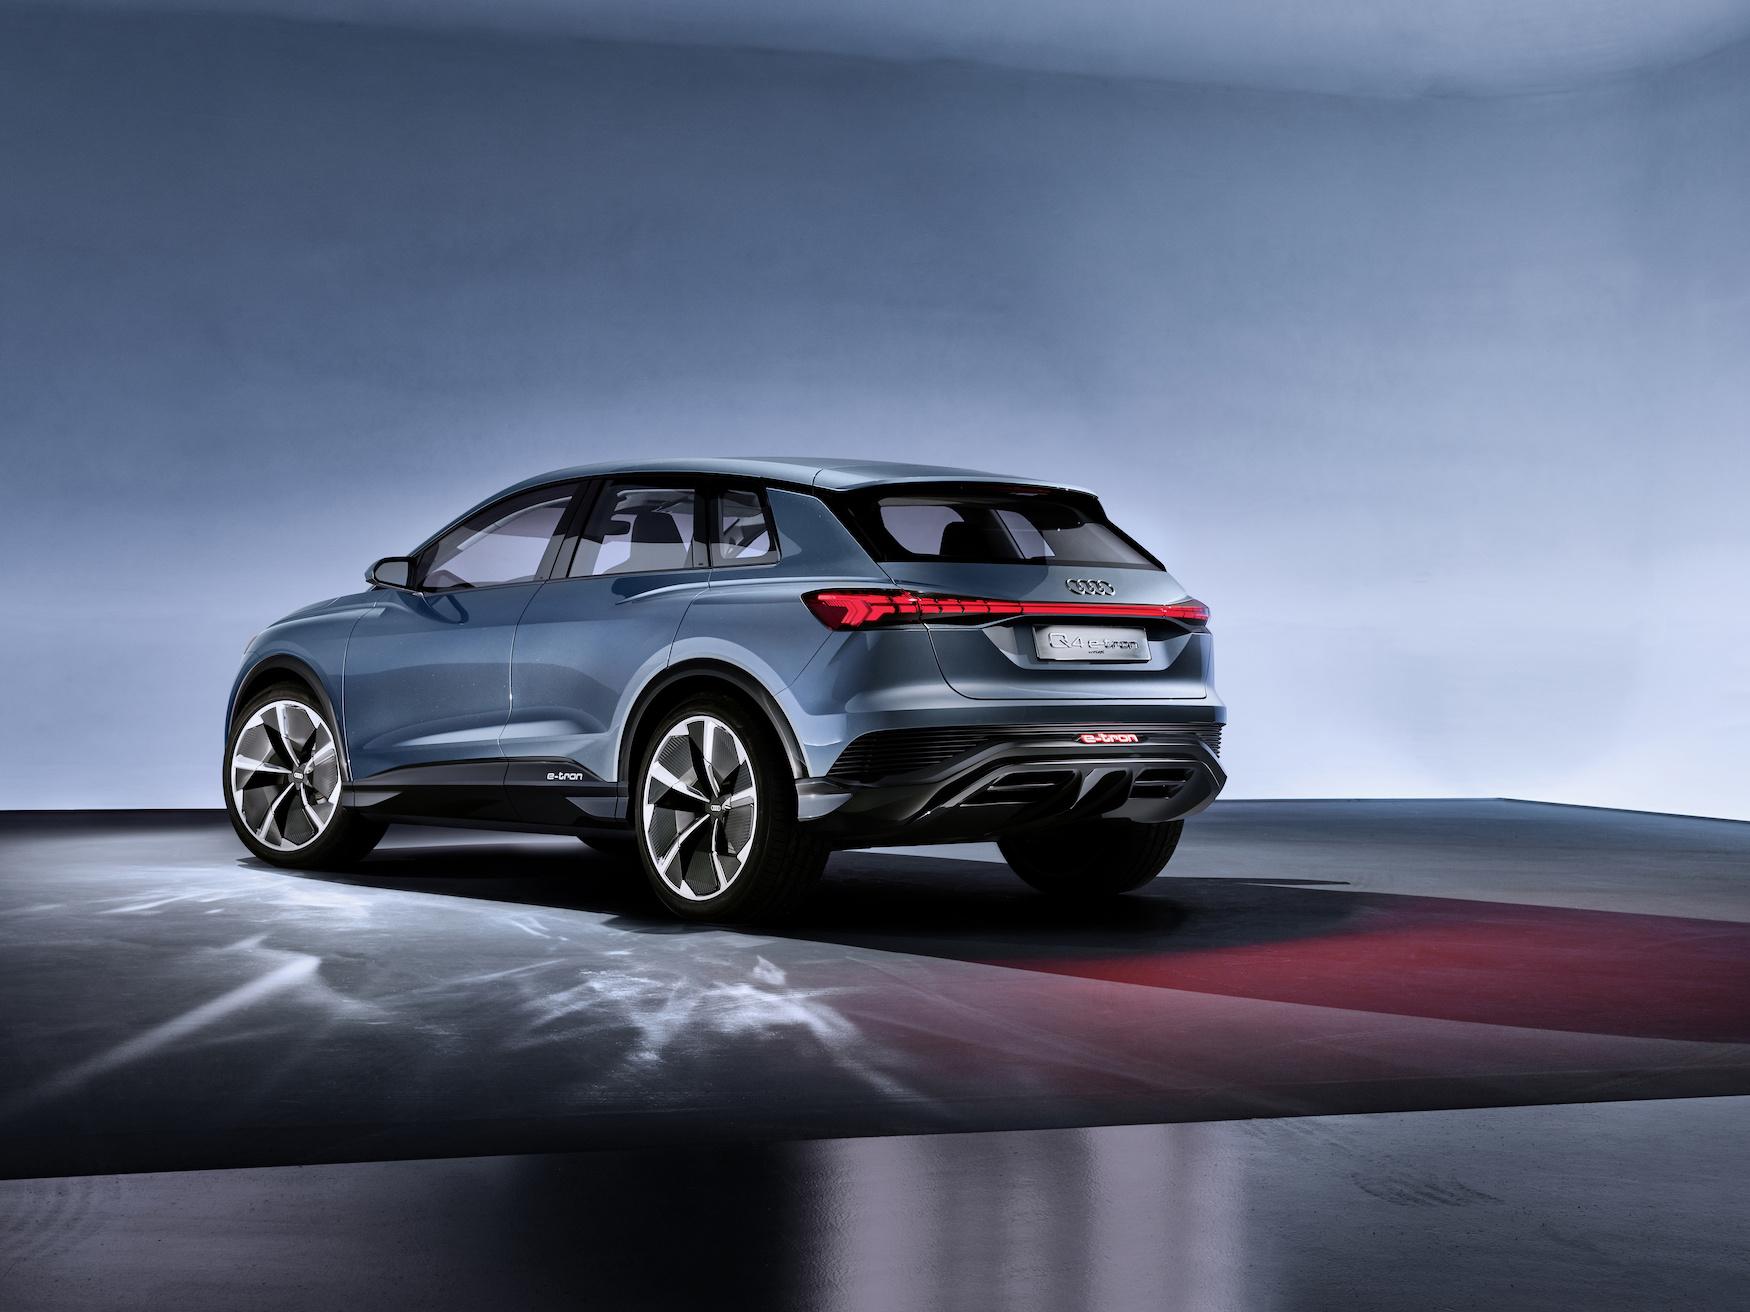 Die blaue Farbe des Audi Q4 e-tron concept macht das Auto nachhaltiger. (AUDI)